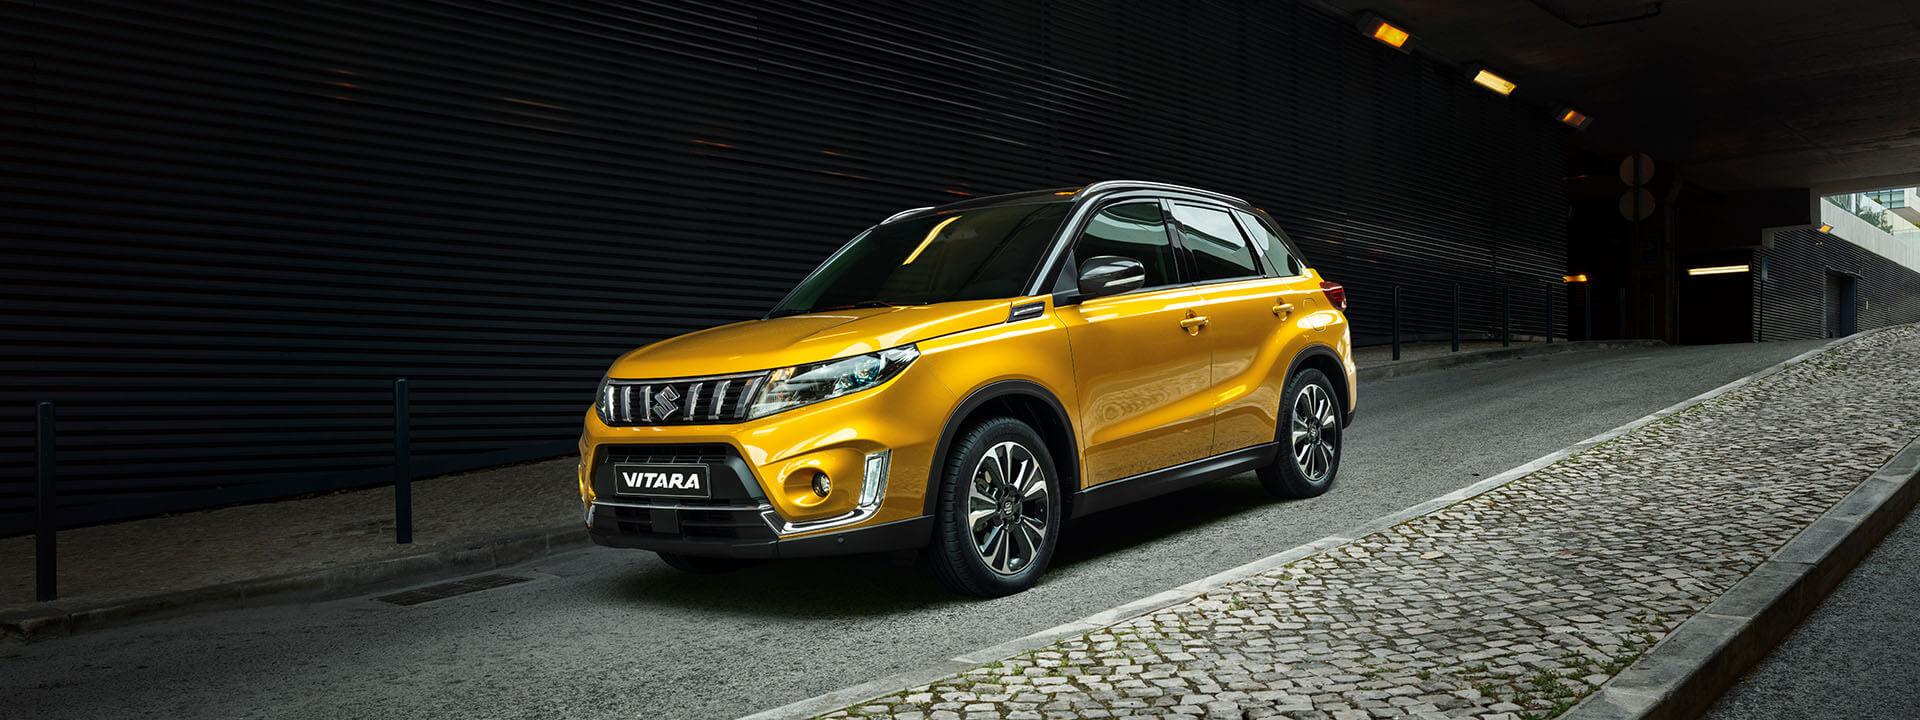 Suzuki Vitara Car Accessories   Suzuki QLD